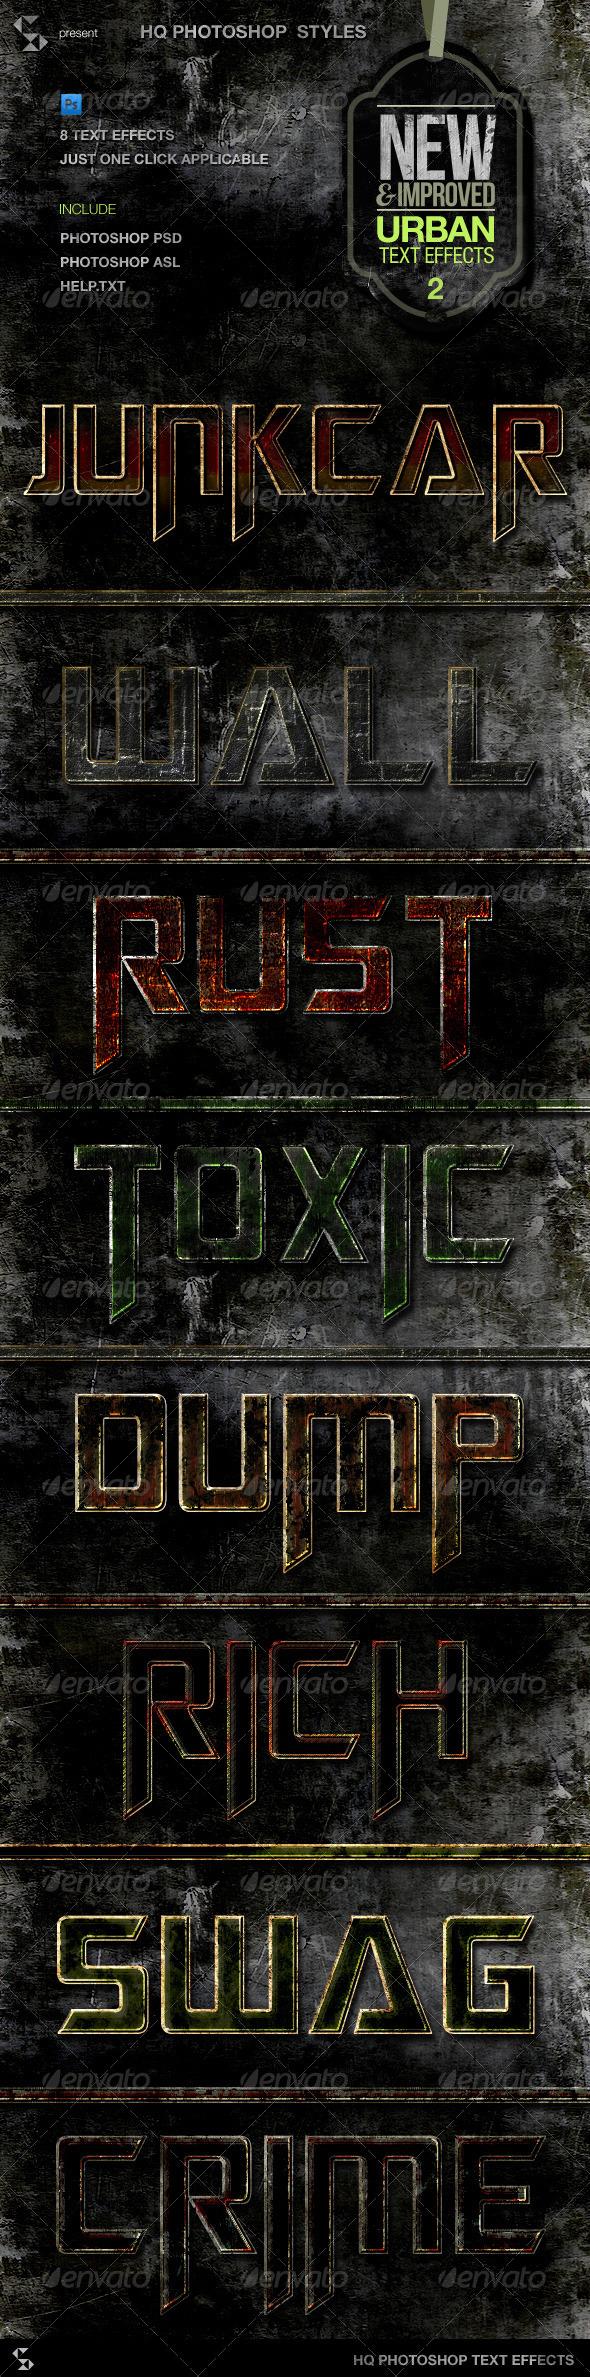 GraphicRiver Urban Grunge Text Effects Vol.2 5905506